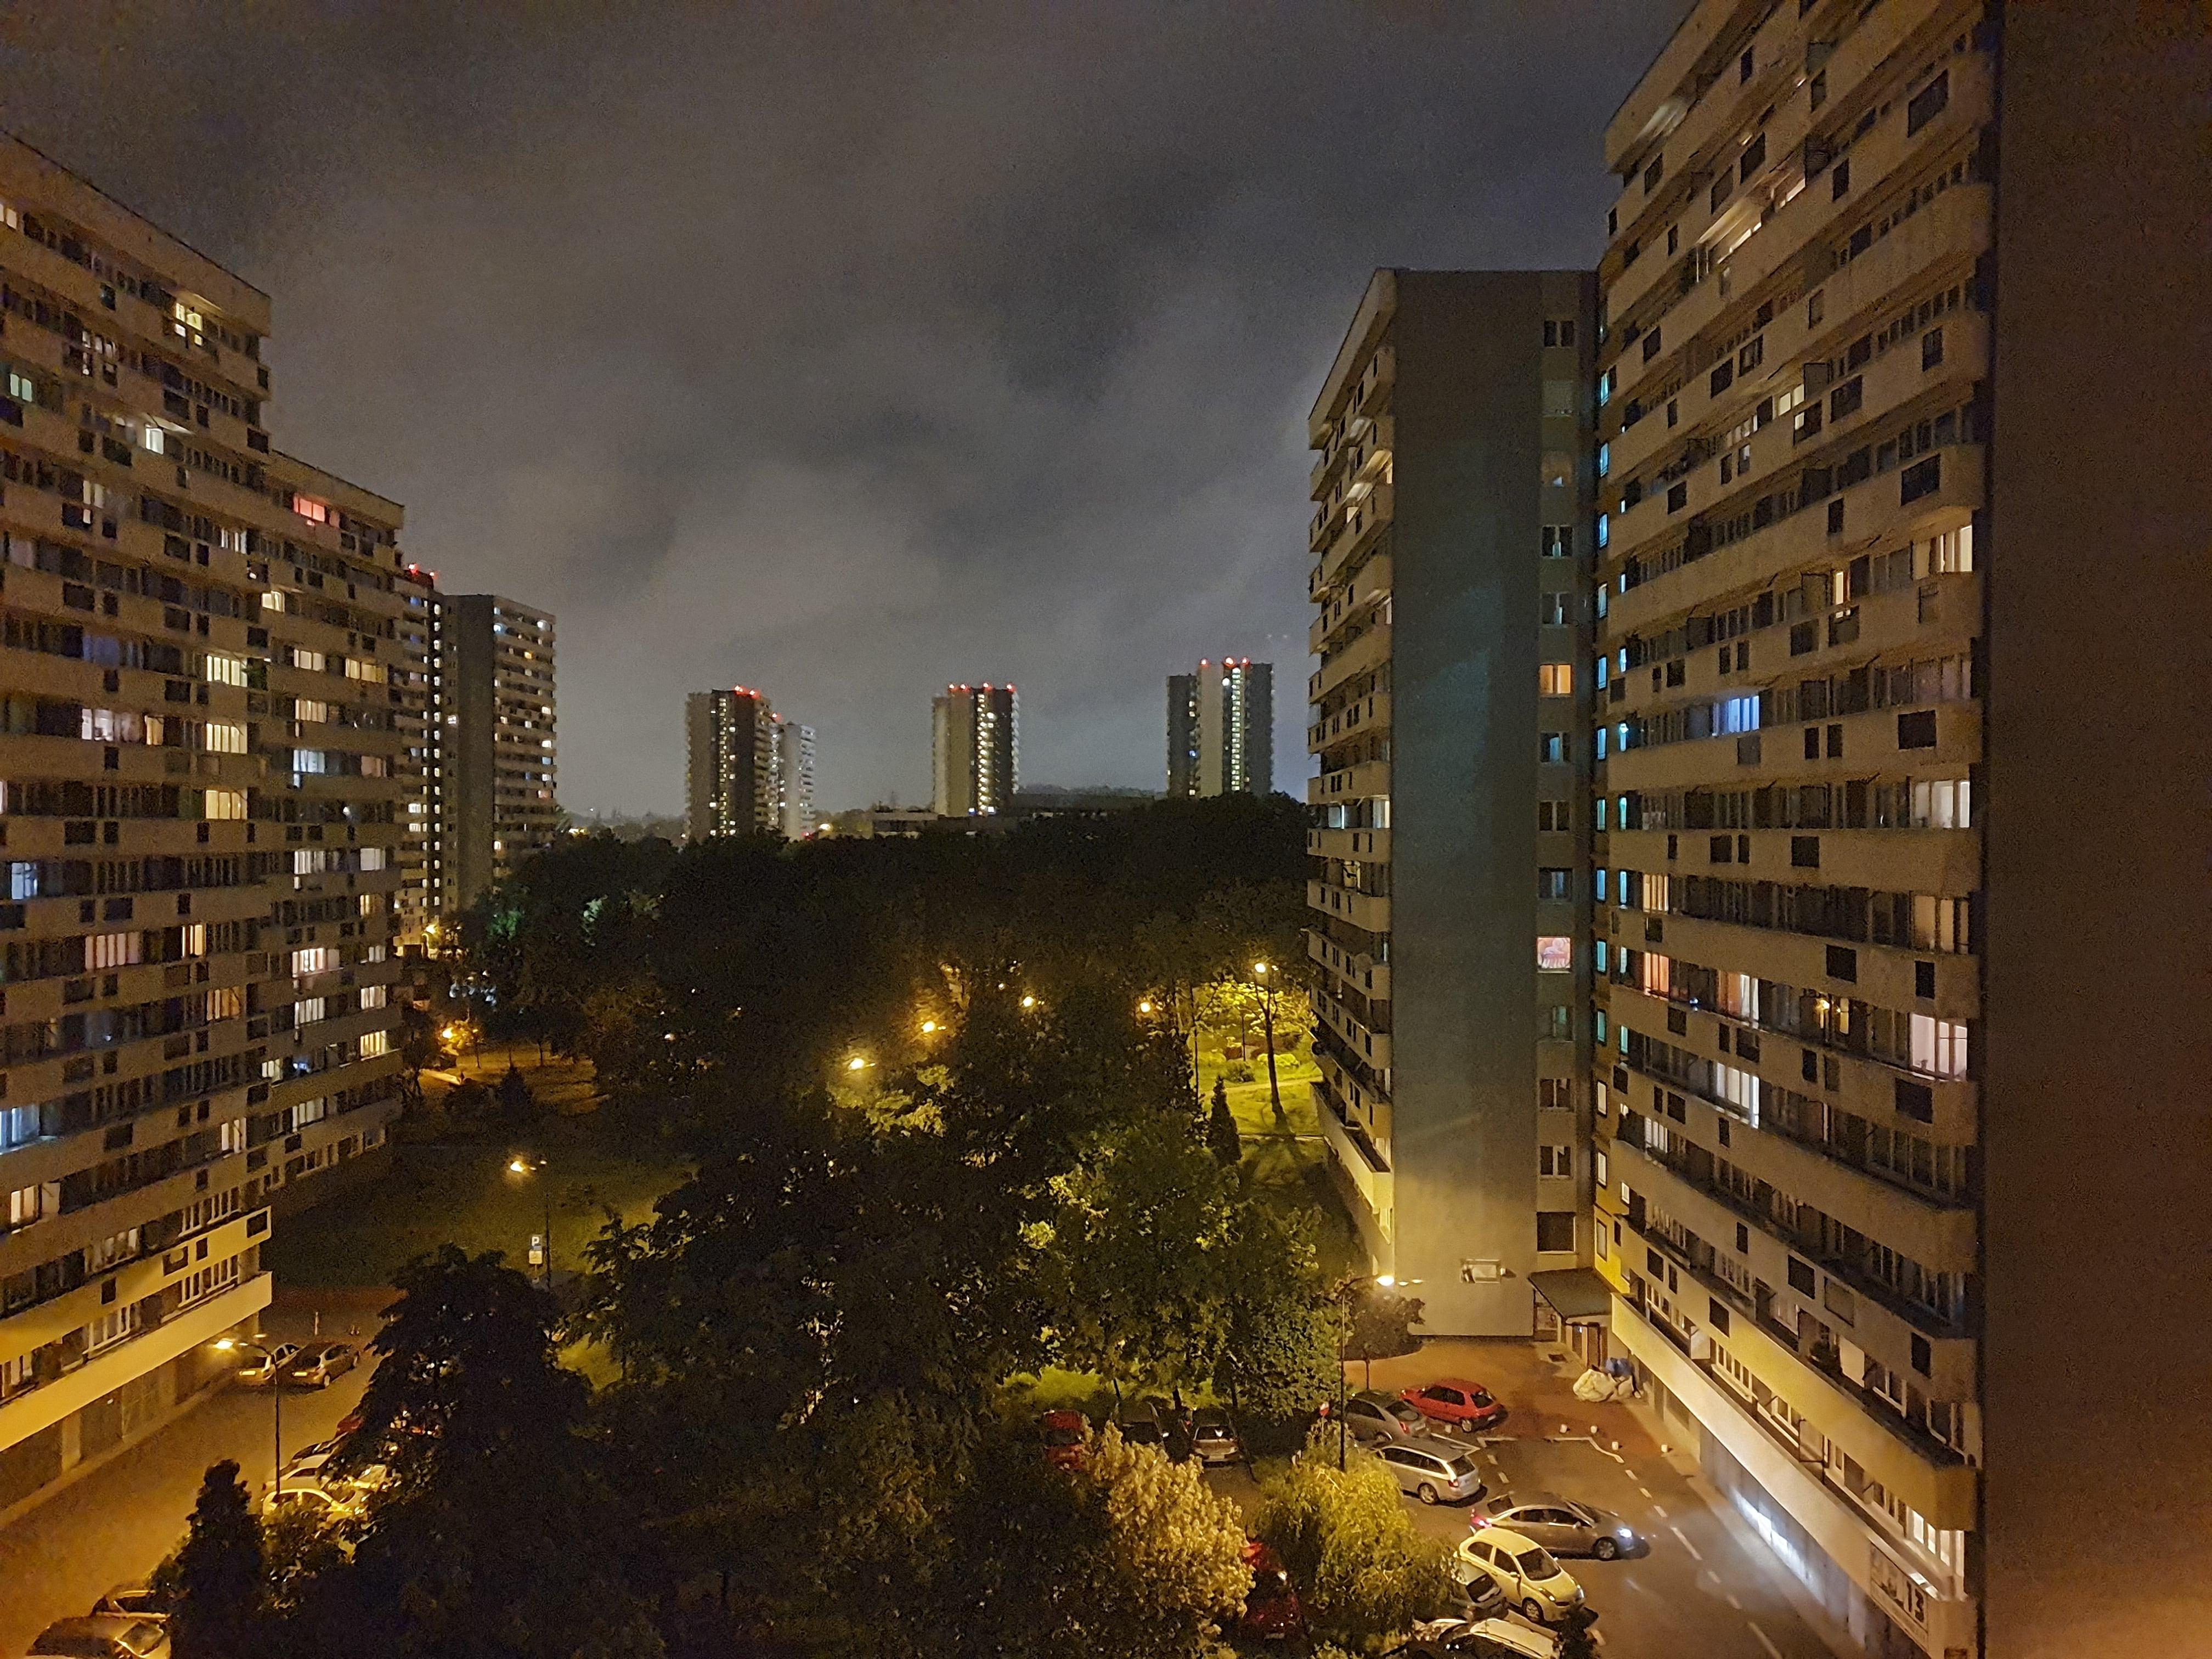 Zdjęcia nocne - Samsung Galaxy S10